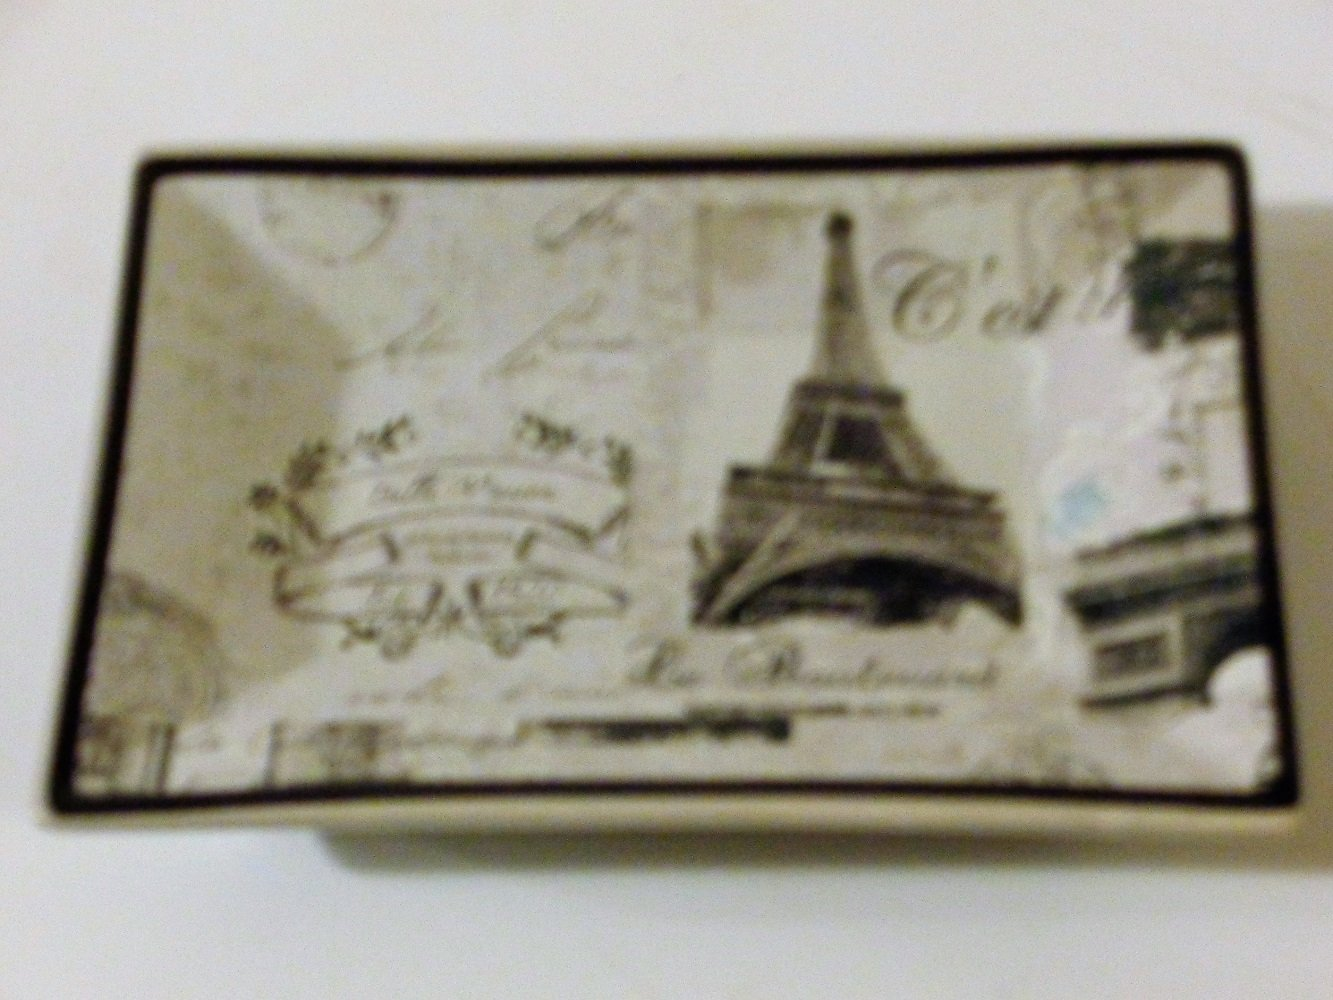 Paris Stamps Eiffel Tower Soap Dish French Bath Decor